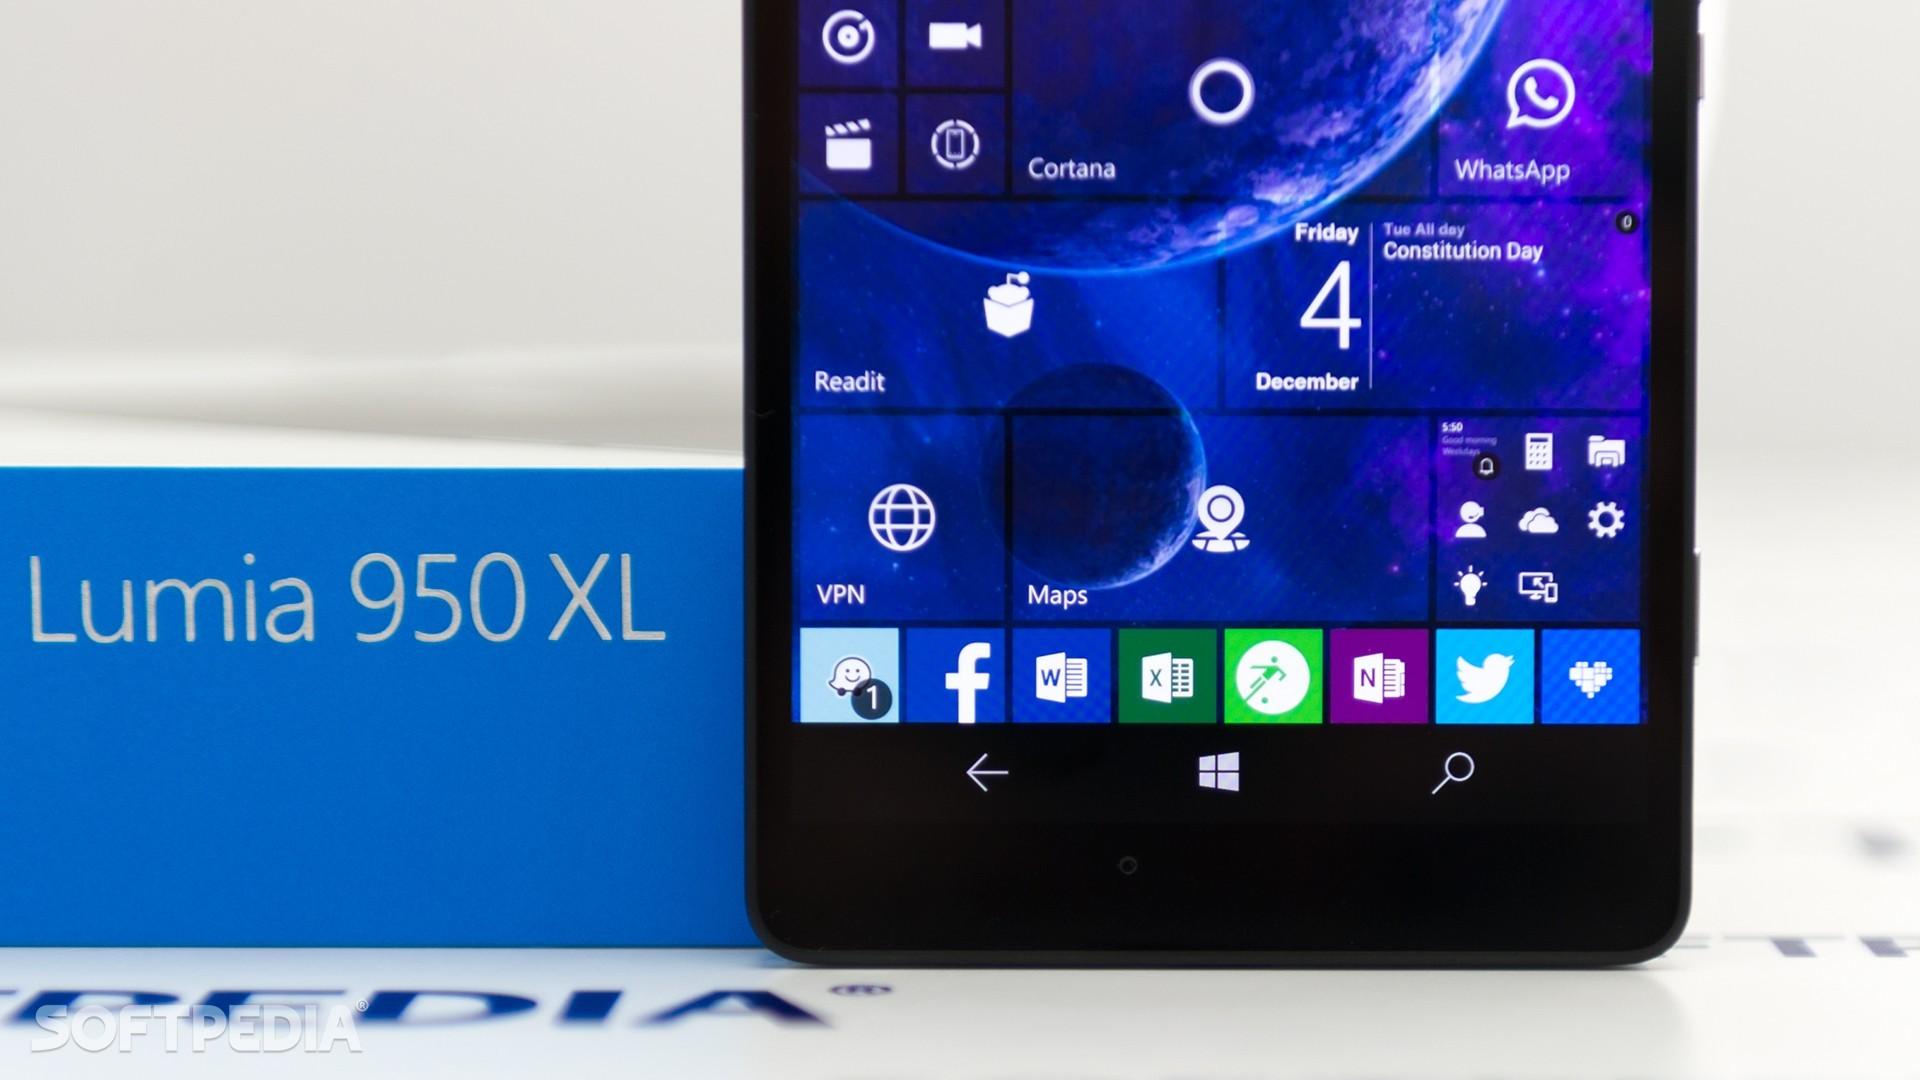 Microsoft to Discontinue Windows 10 Mobile FM Radio App